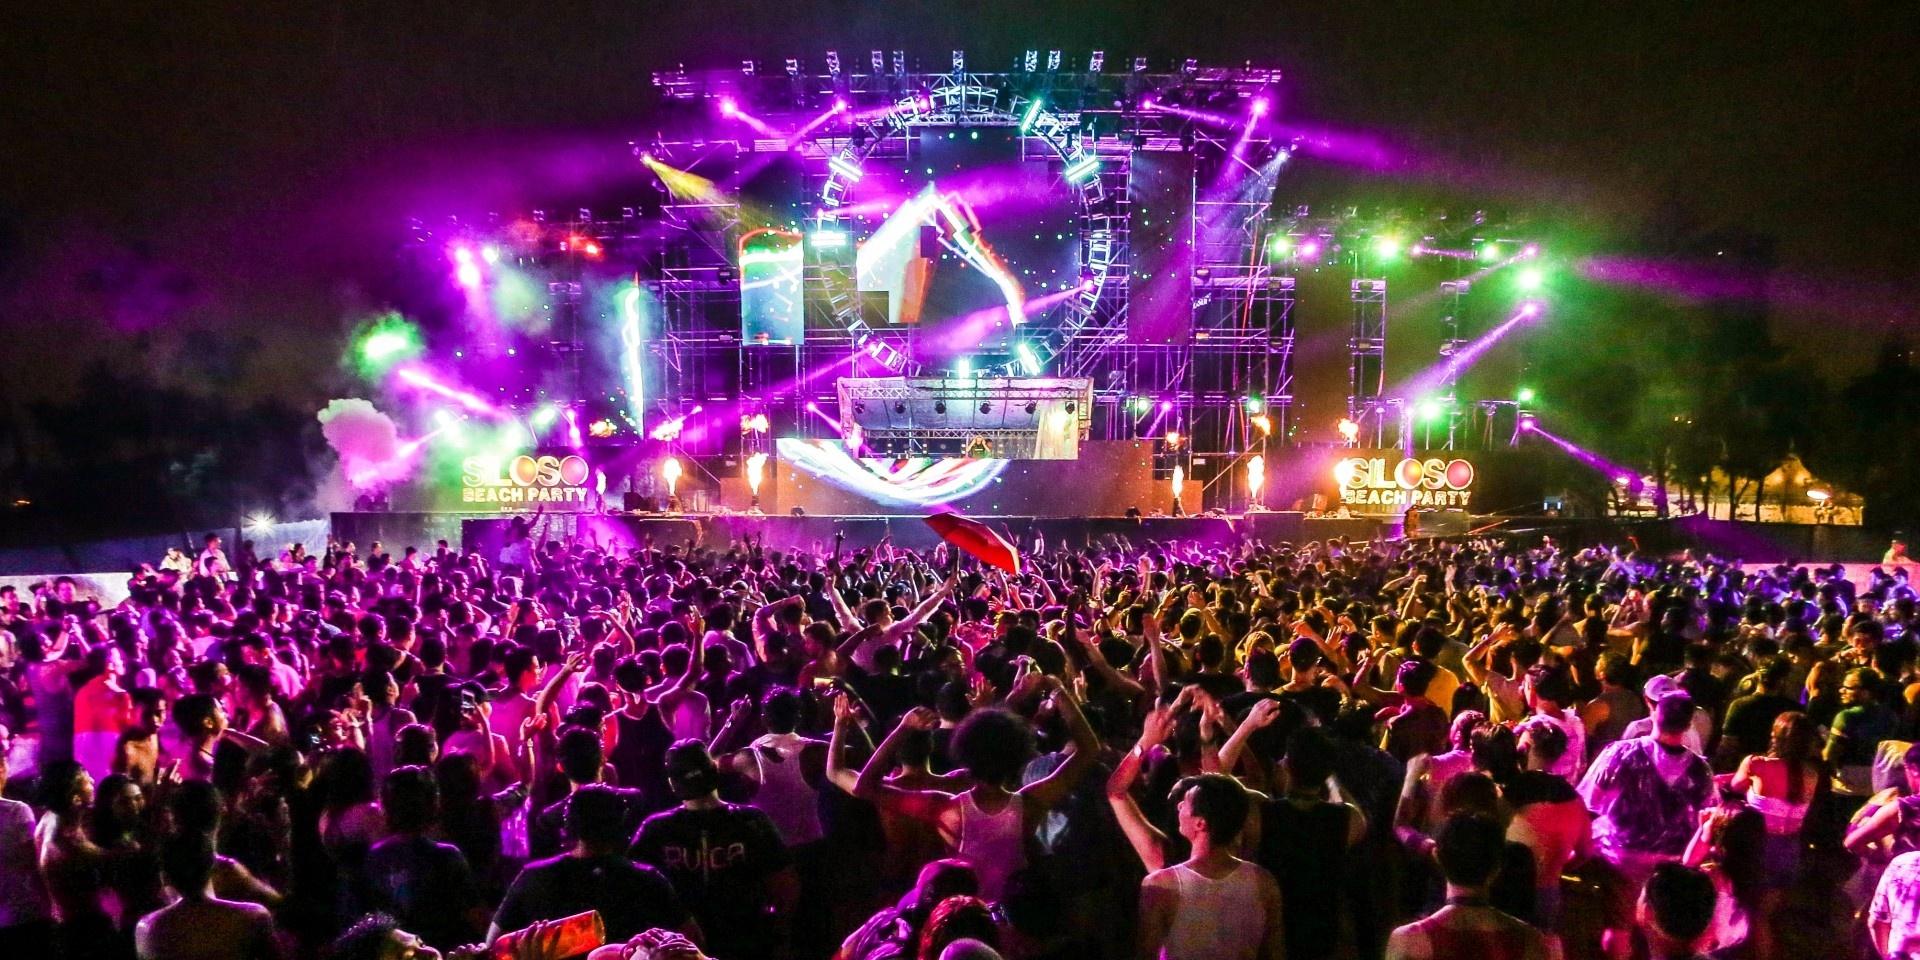 Bid 2018 an epic farewell with the Siloso Beach Party